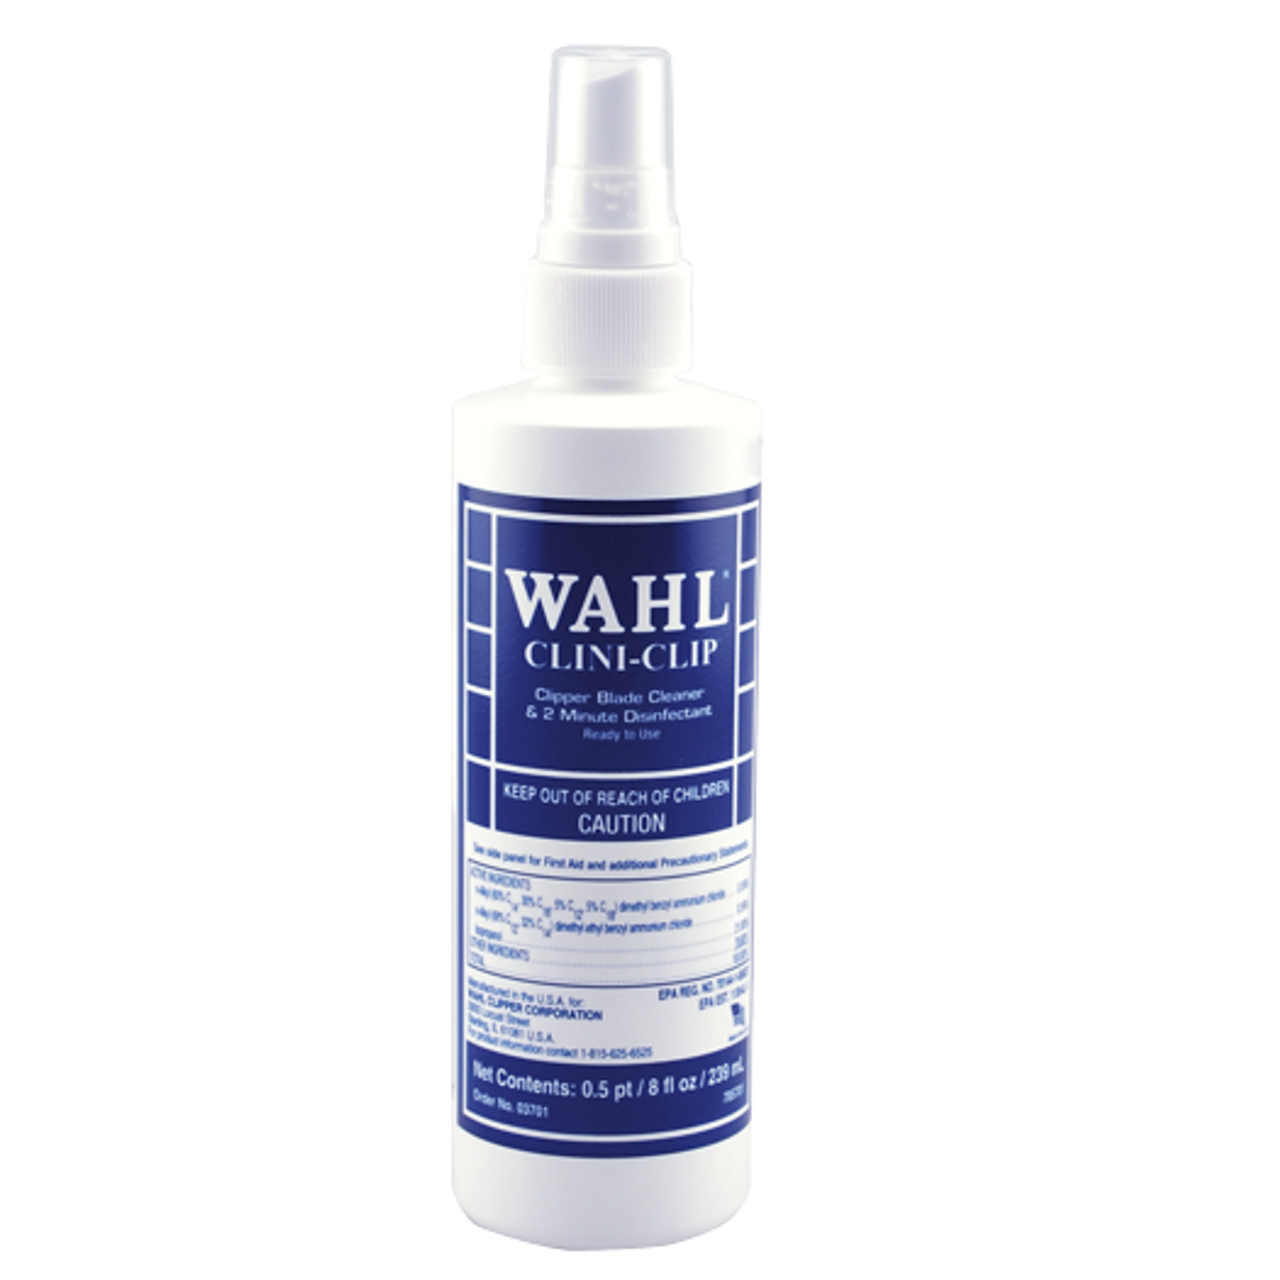 Wahl Clini Clip Disinfectant Spray